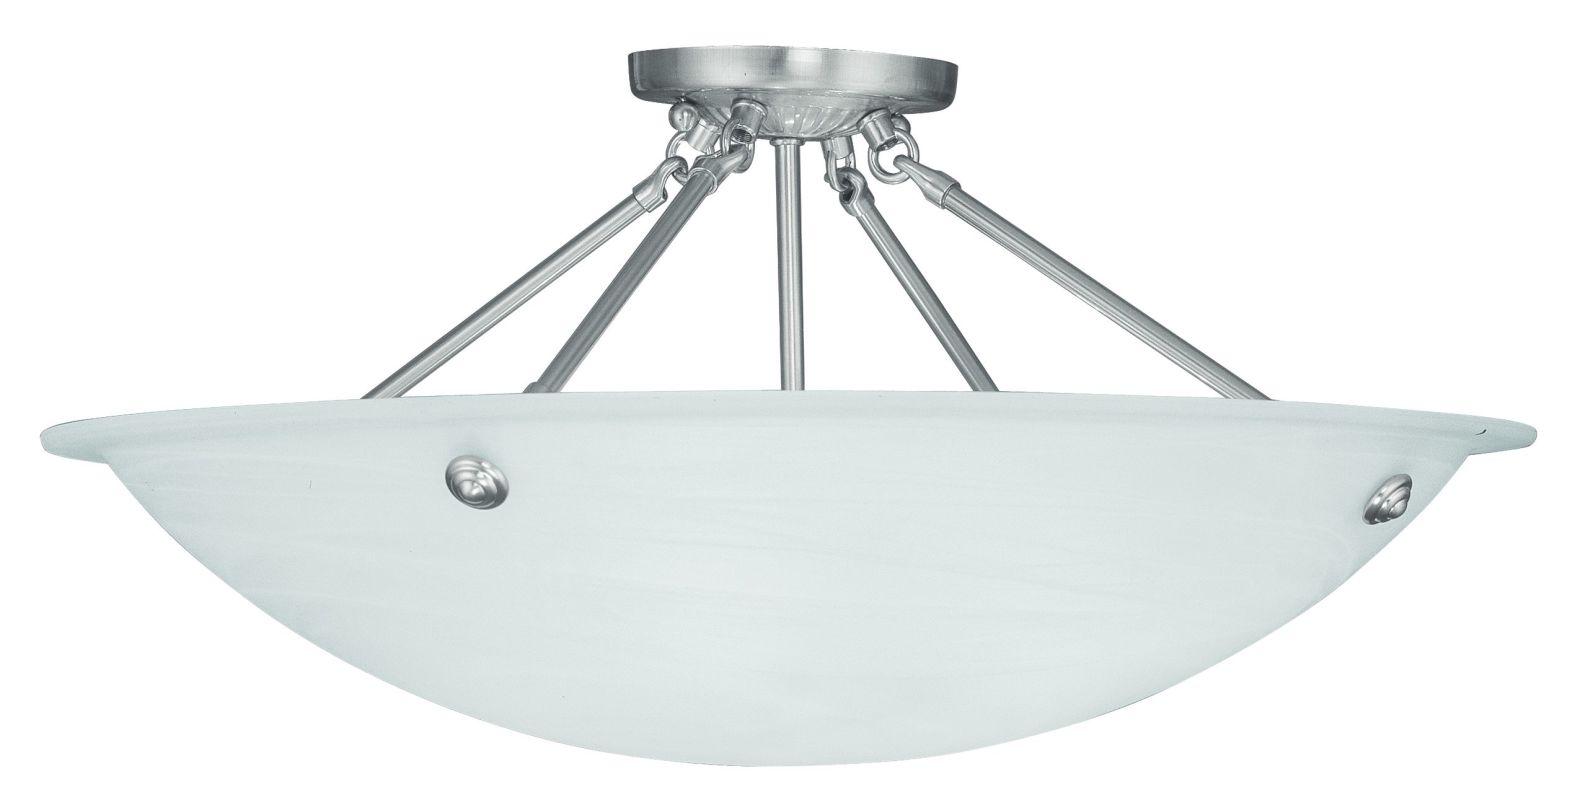 Livex Lighting 4275 Oasis 4 Light Semi-Flush Ceiling Fixture Brushed